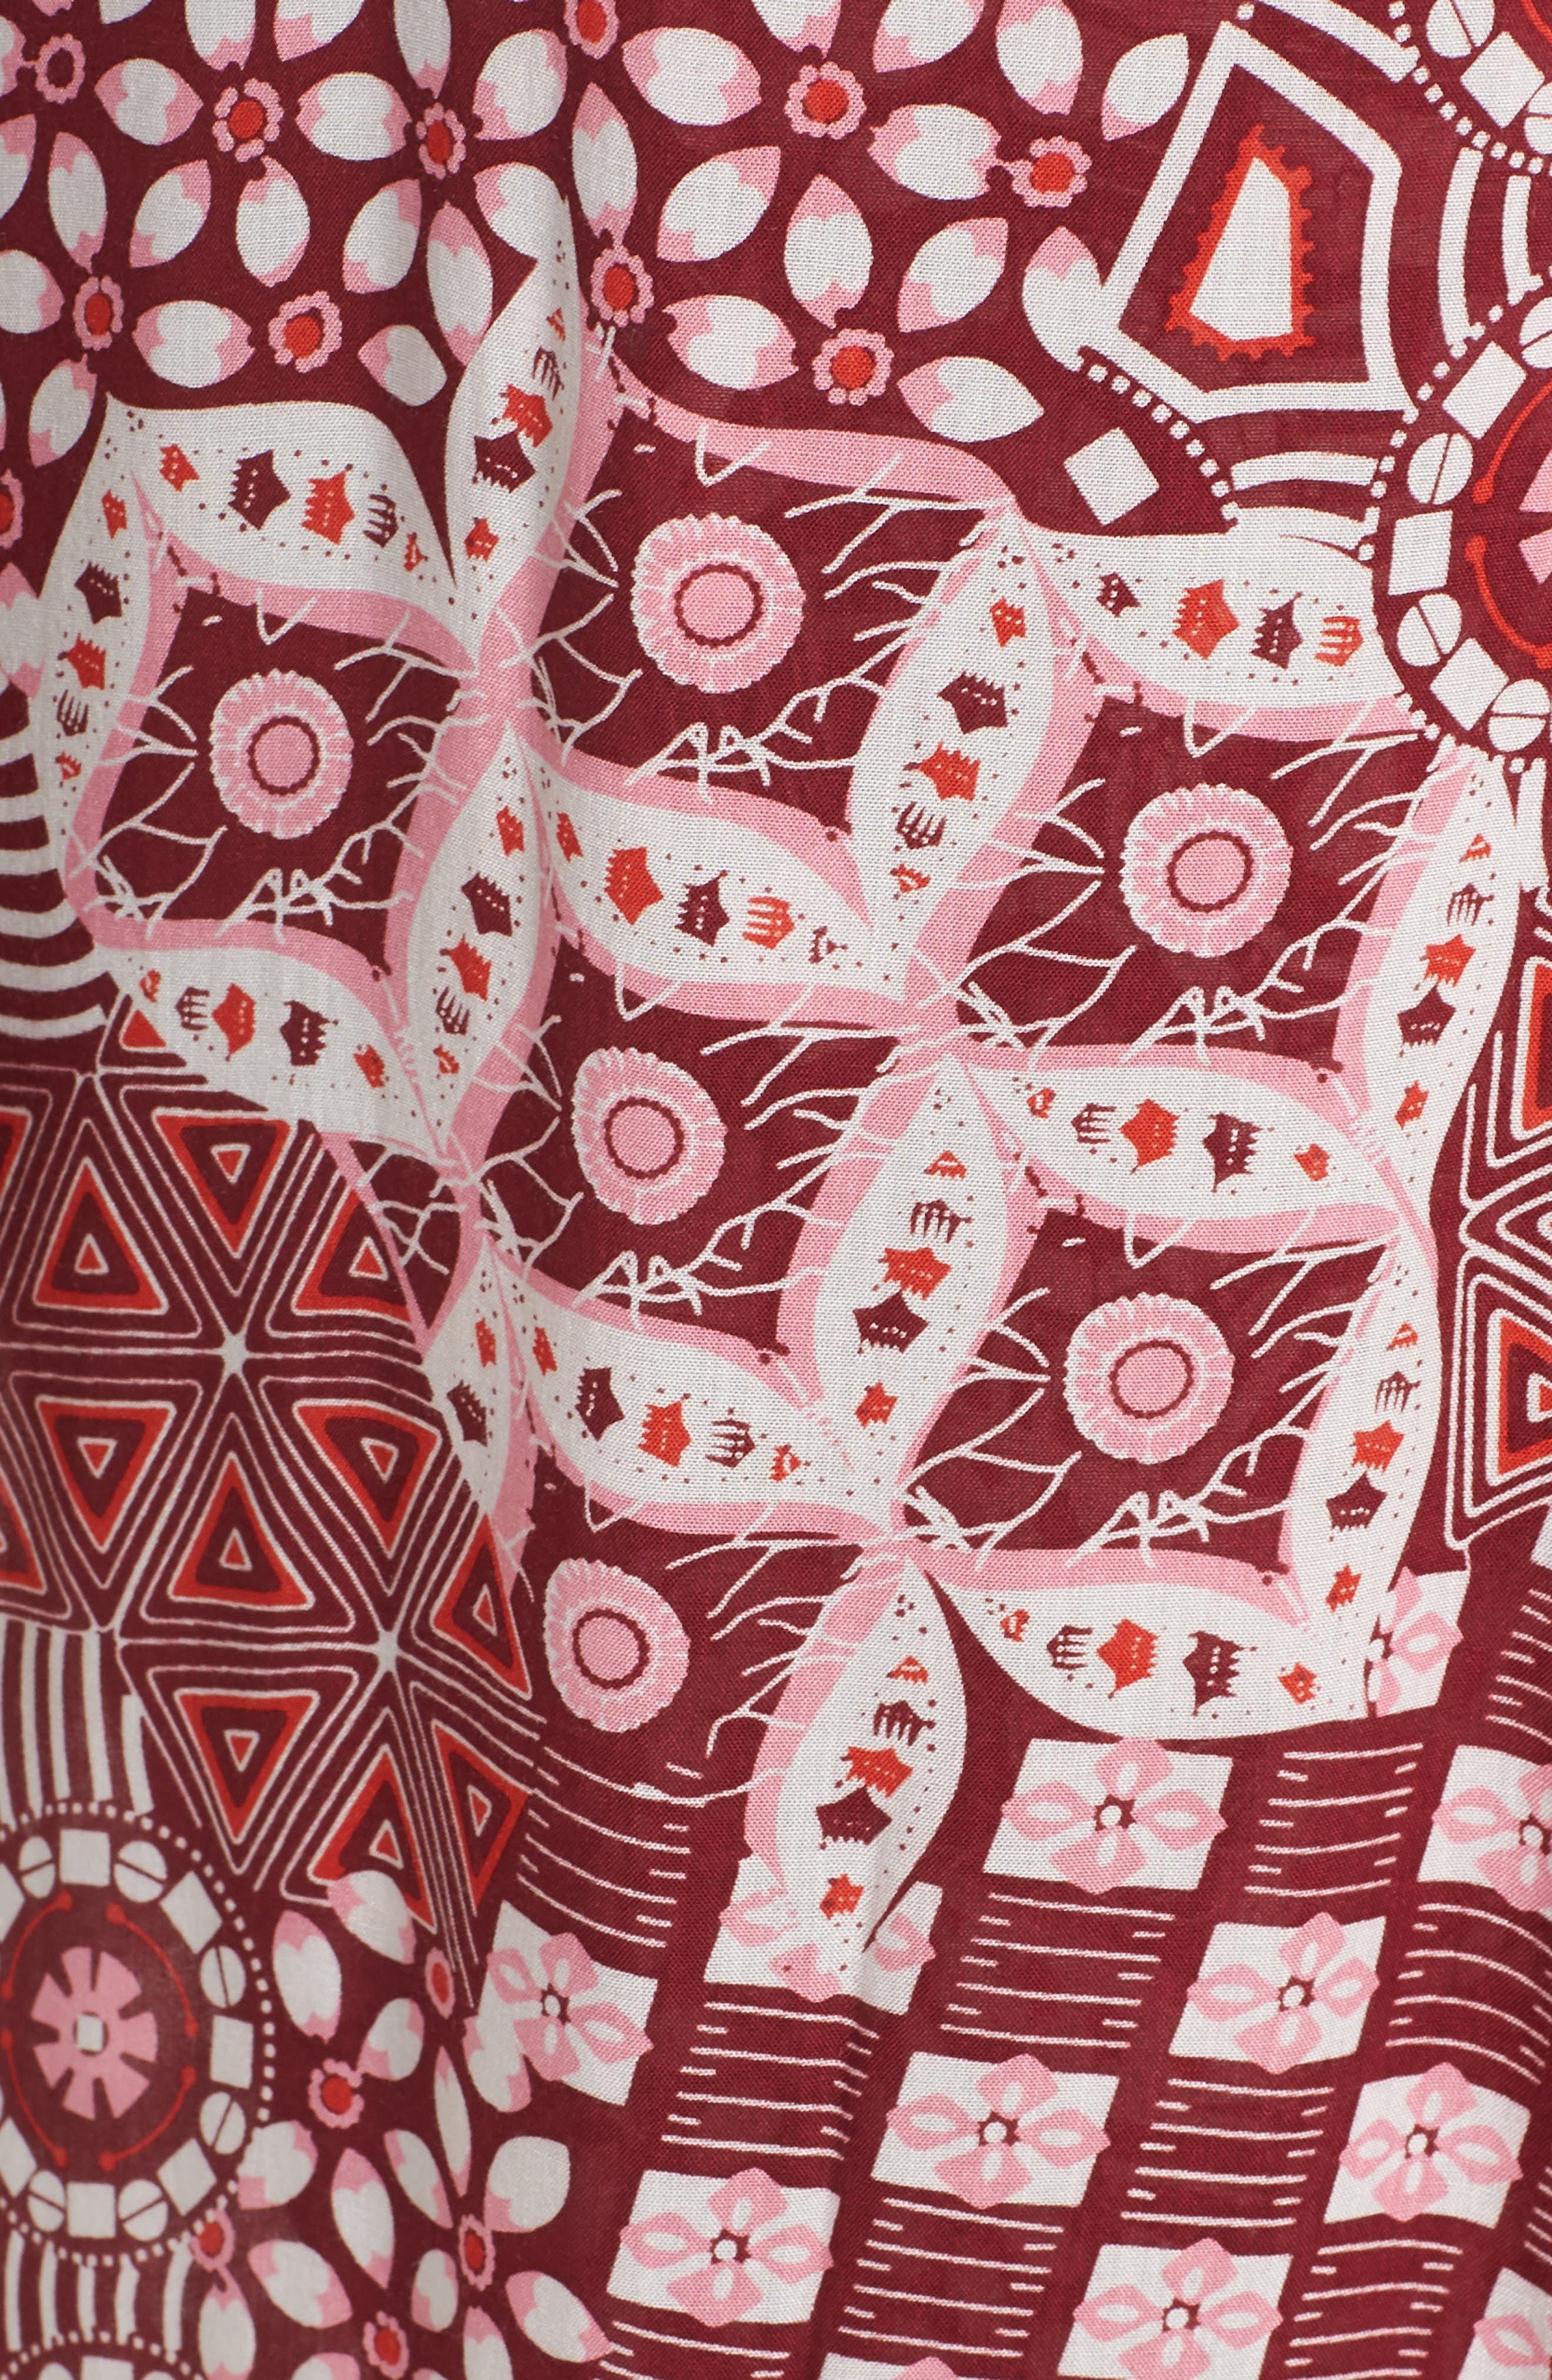 Poupette St. Barth Joe Cover-Up Maxi Dress,                             Alternate thumbnail 5, color,                             Pink Mali